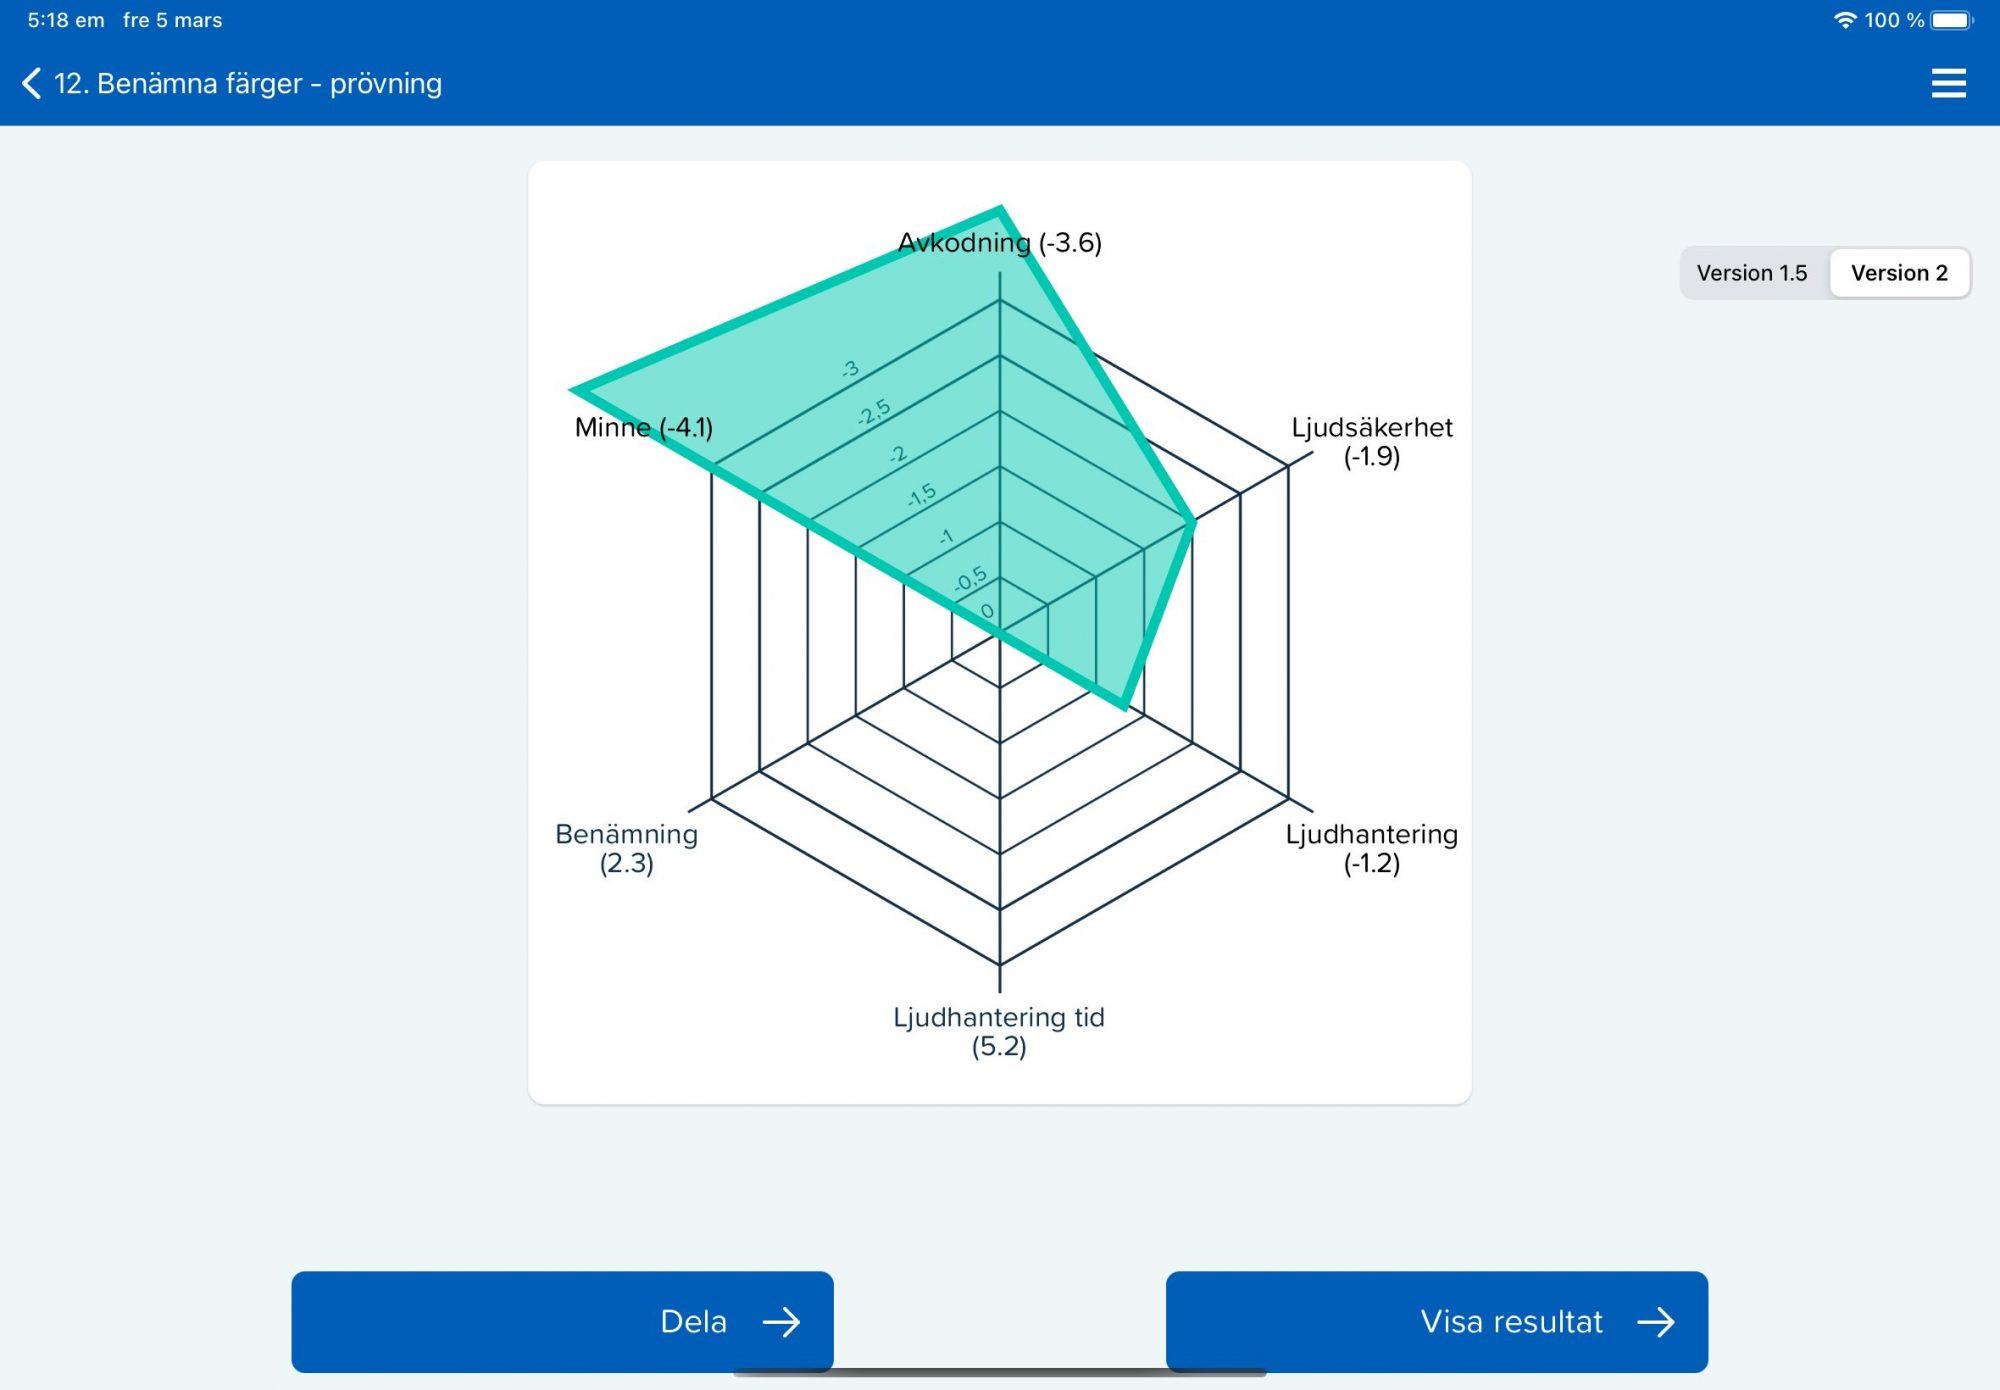 Fonologia case study resultat app